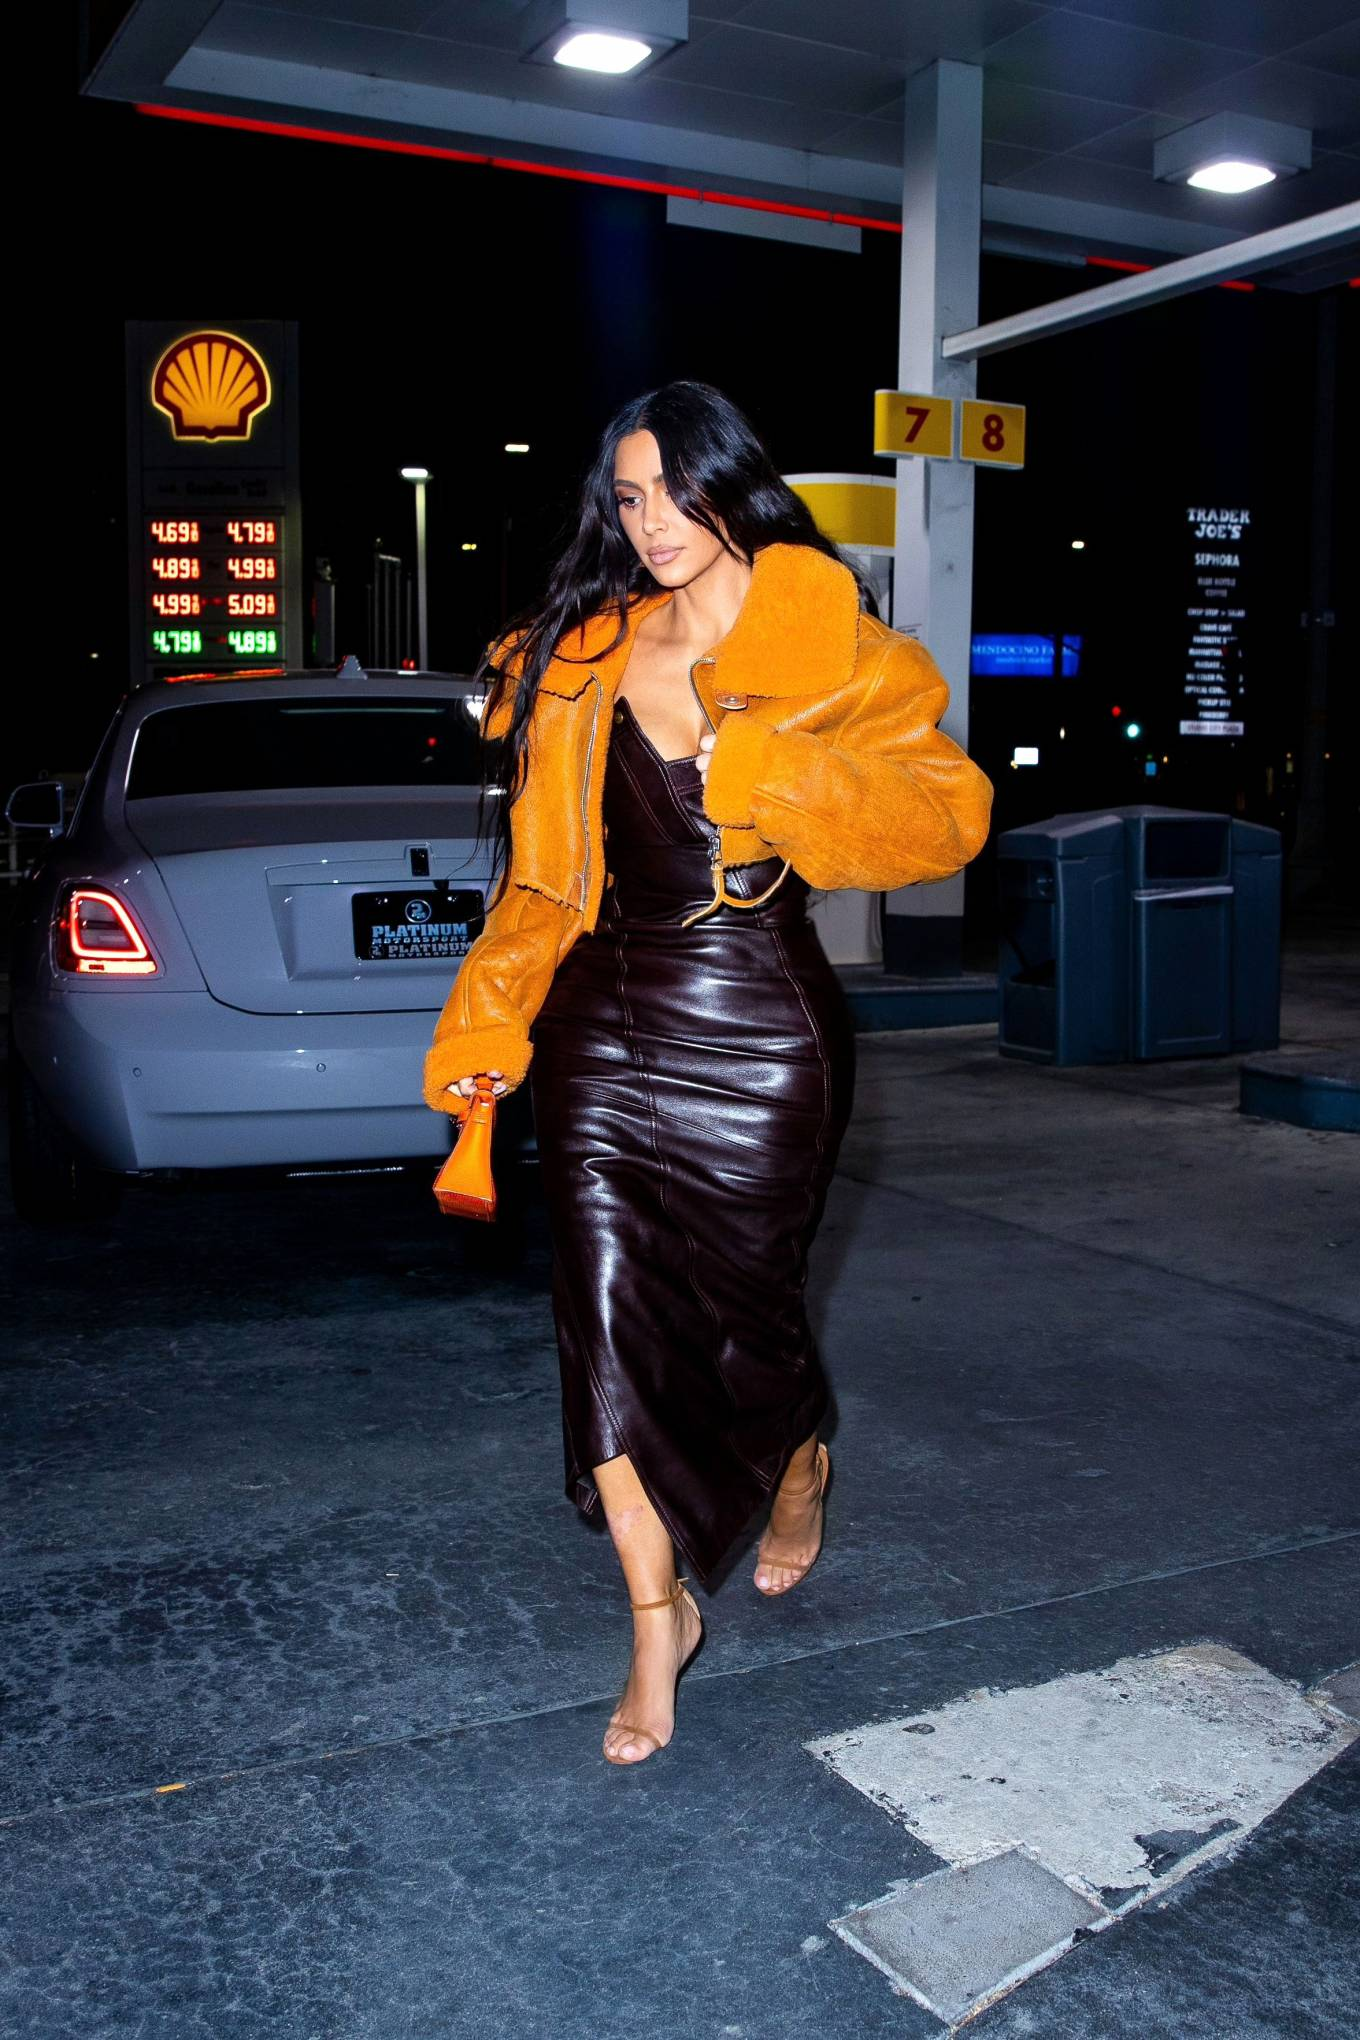 Kim Kardashian donning pointed orange open toe sandals with high heel